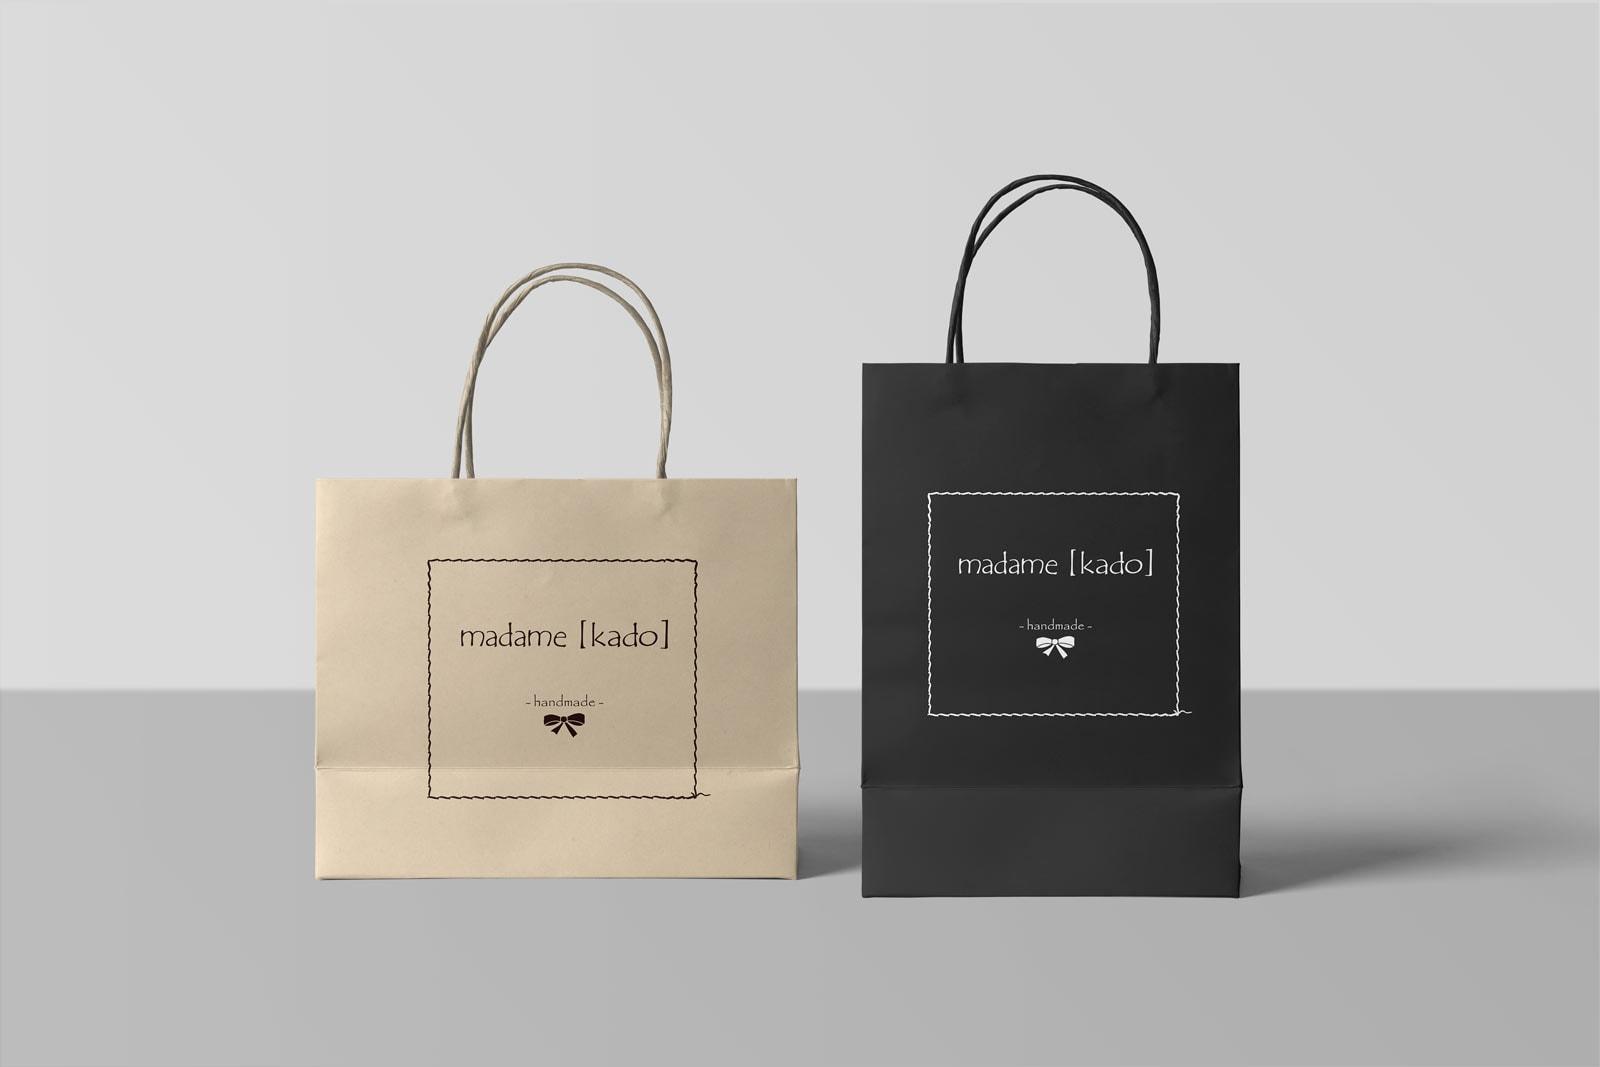 madame kado, Papiertaschen, Branding, Retail Design